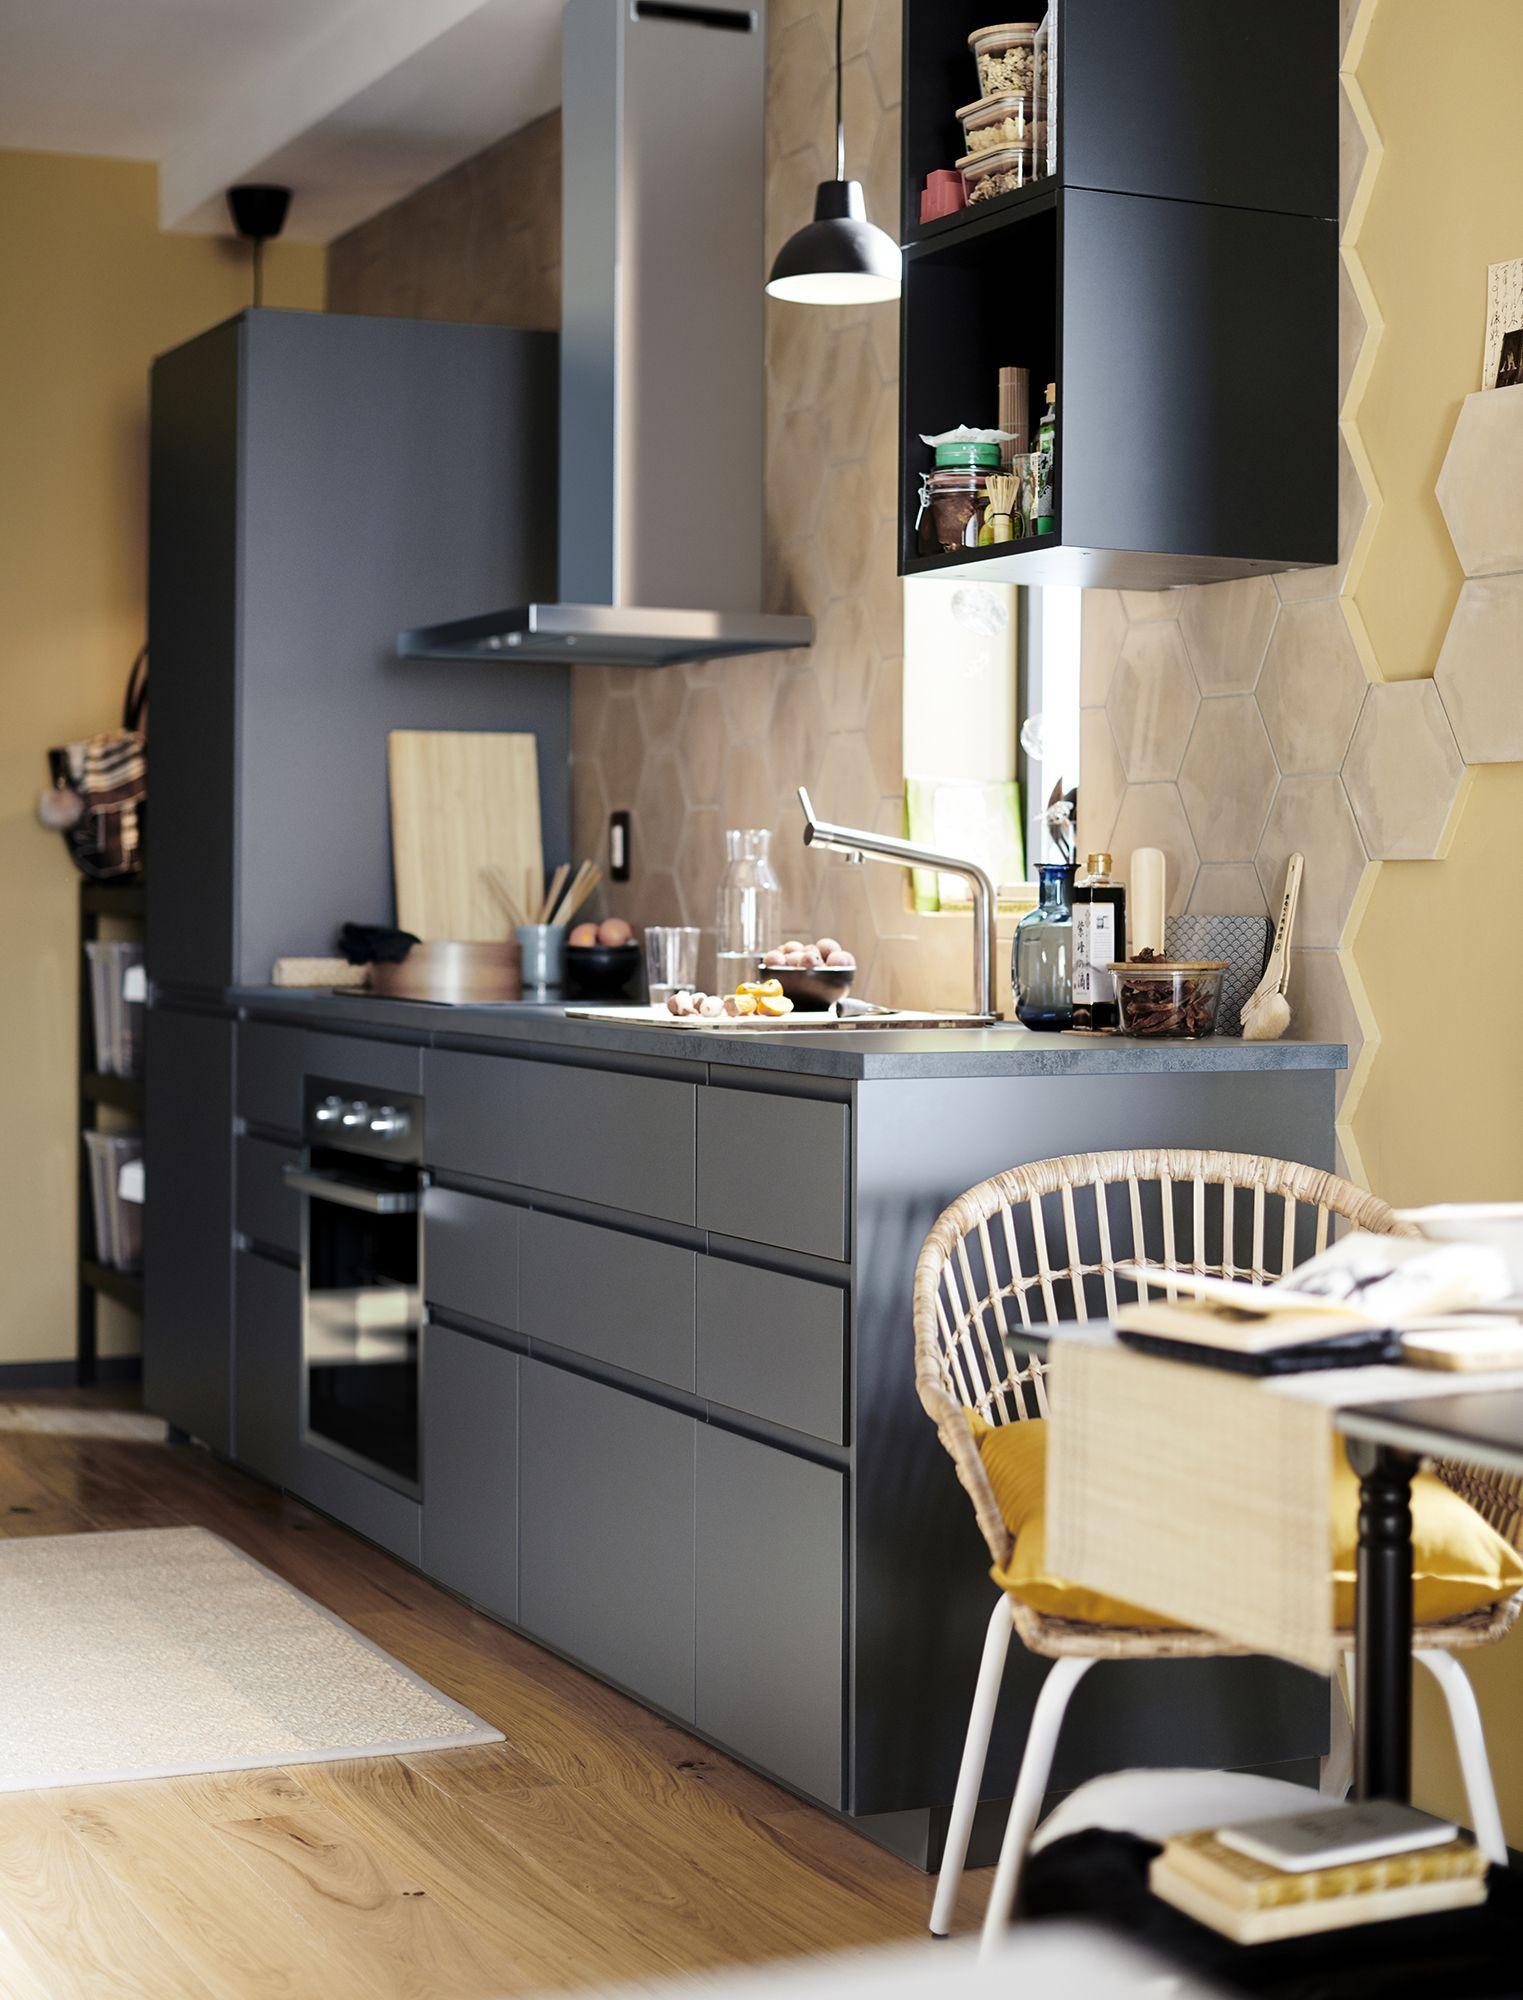 Descubre Antes Que Nadie El Catálogo Ikea 2020 Diseño De Despensa De Cocina Cocina Renovada Cocina Ikea